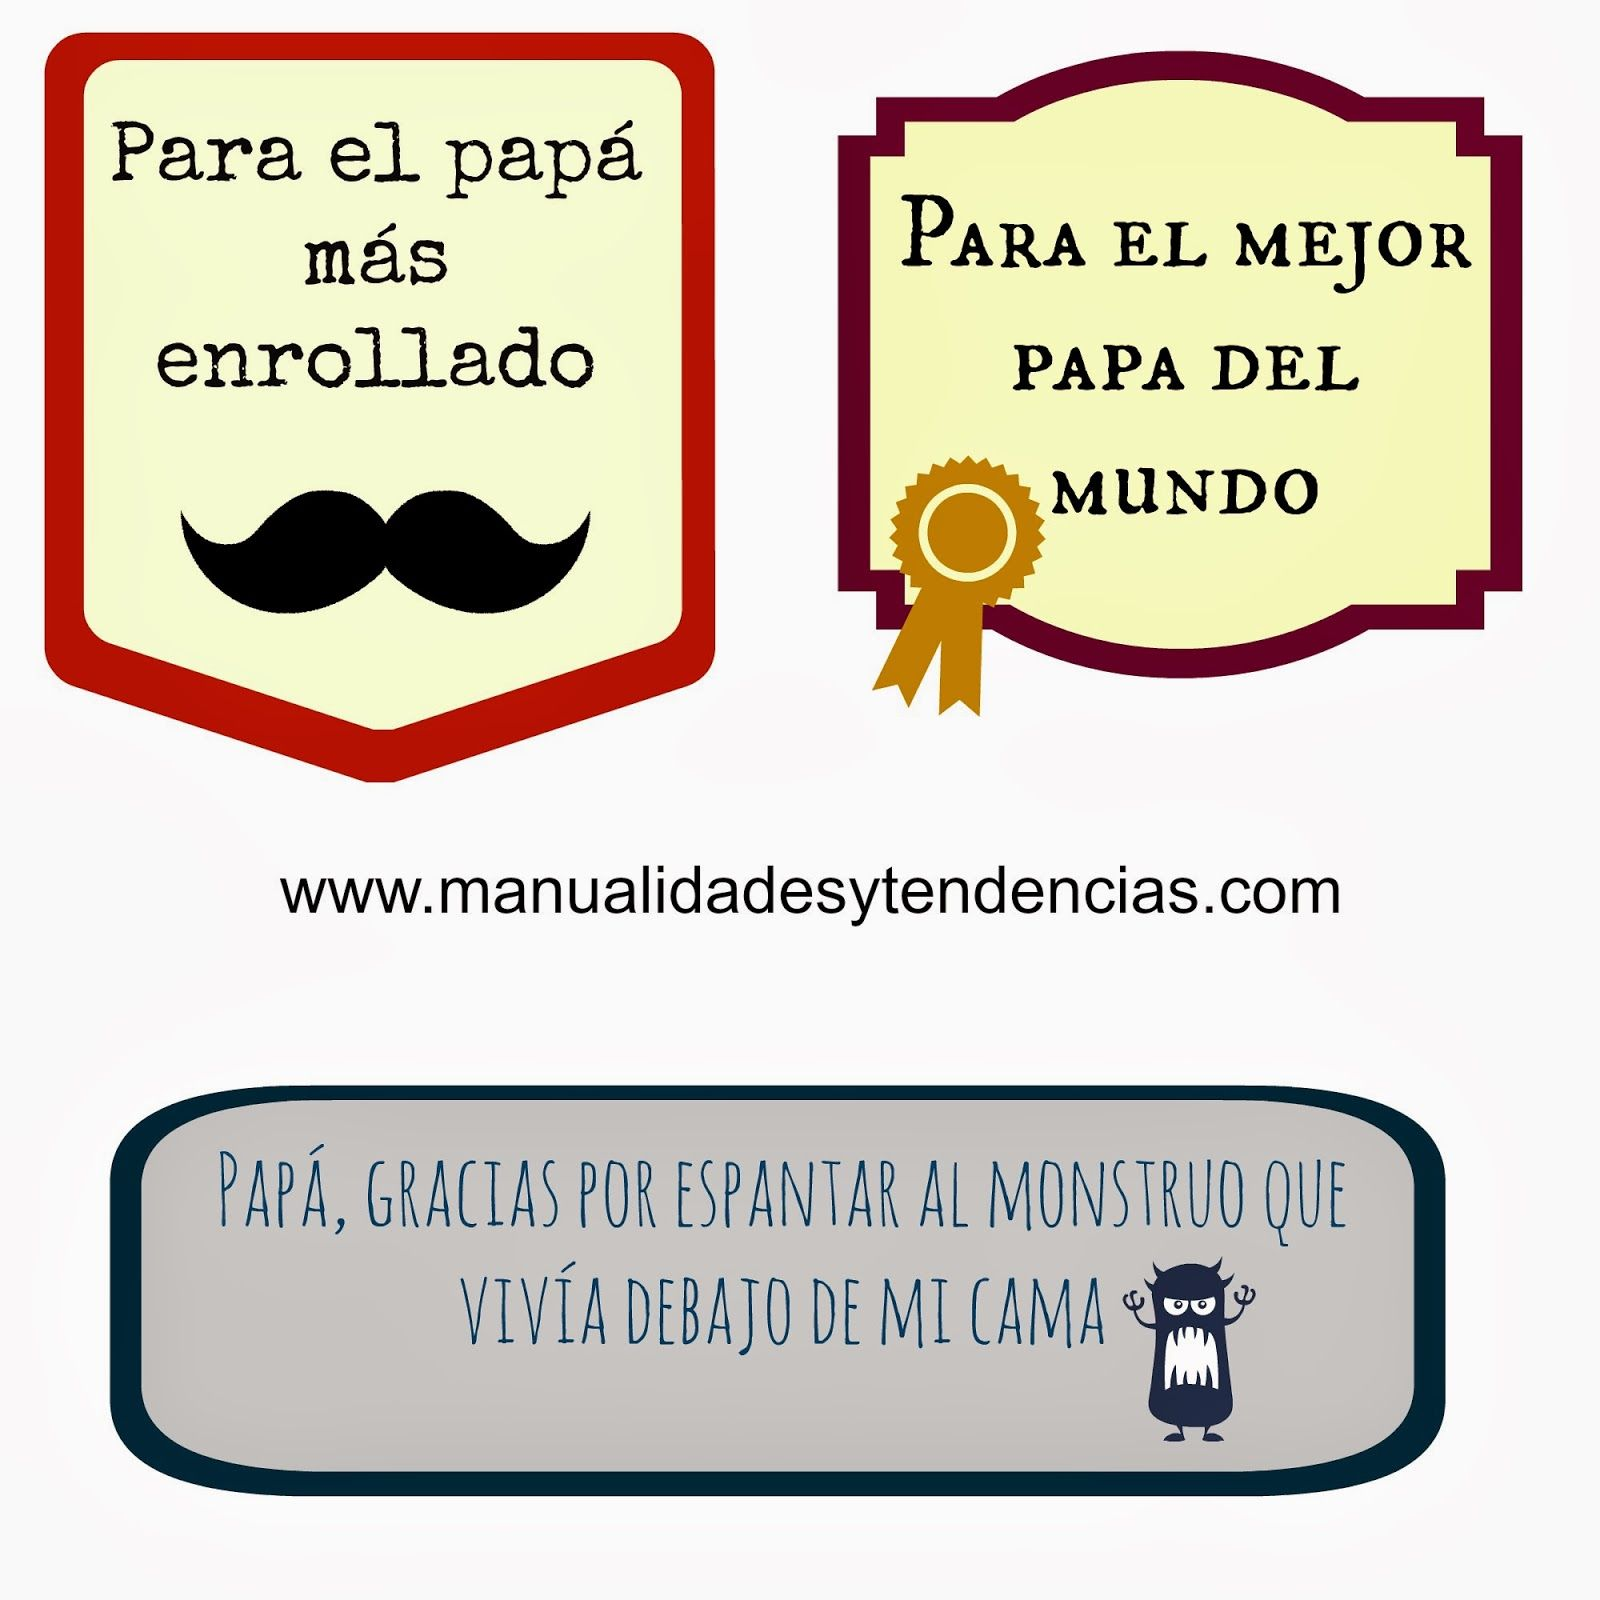 Imprimibles Gratis Etiquetas De Regalo Para El Dia Del Padre